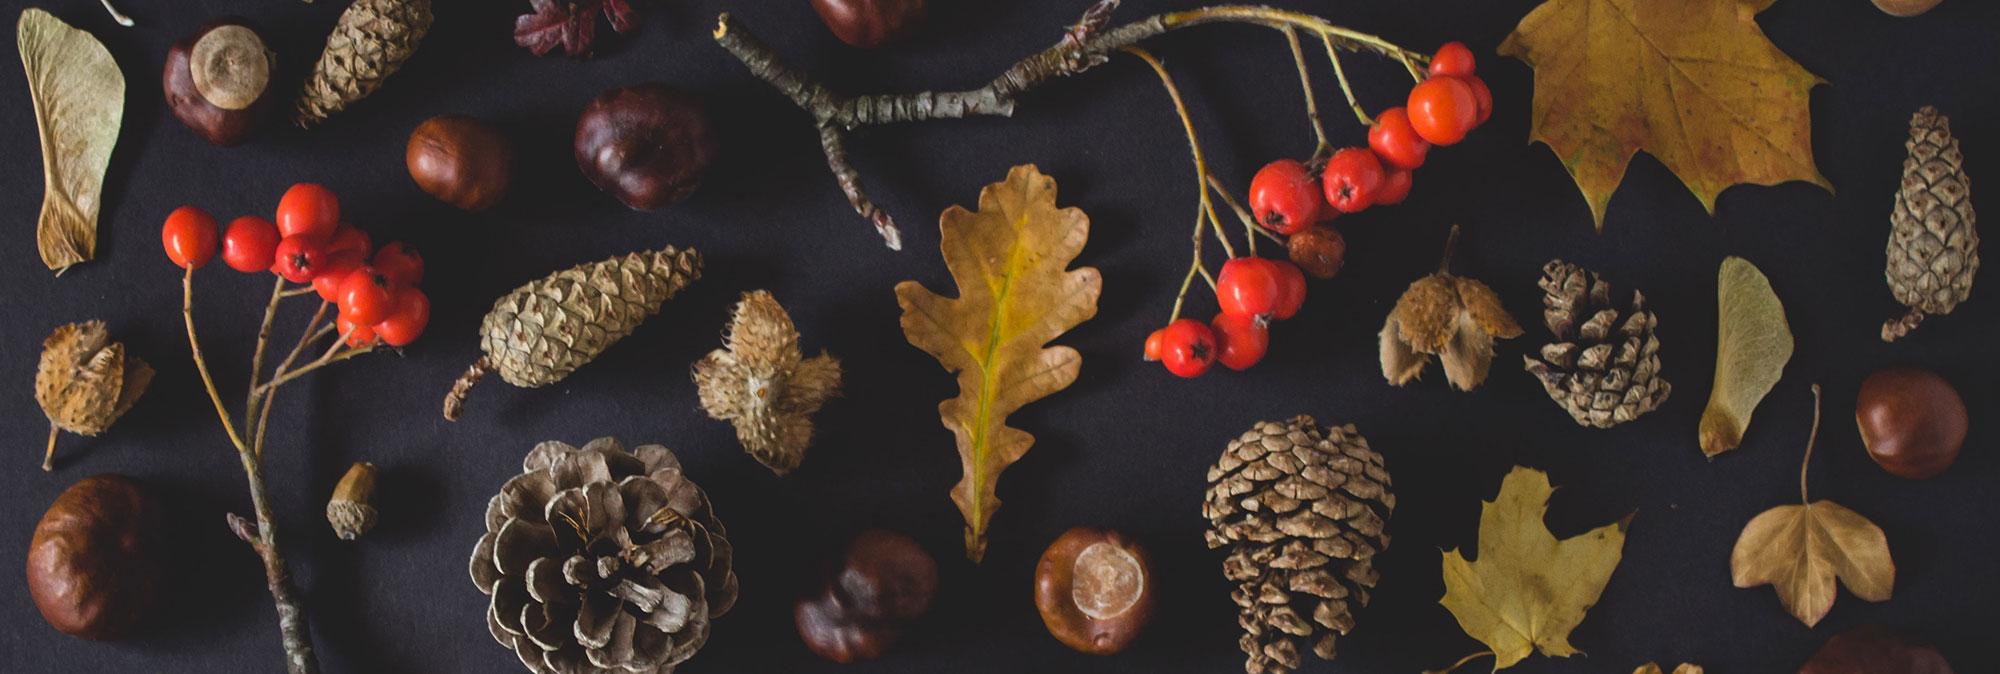 Thanksgiving blog banner 2018